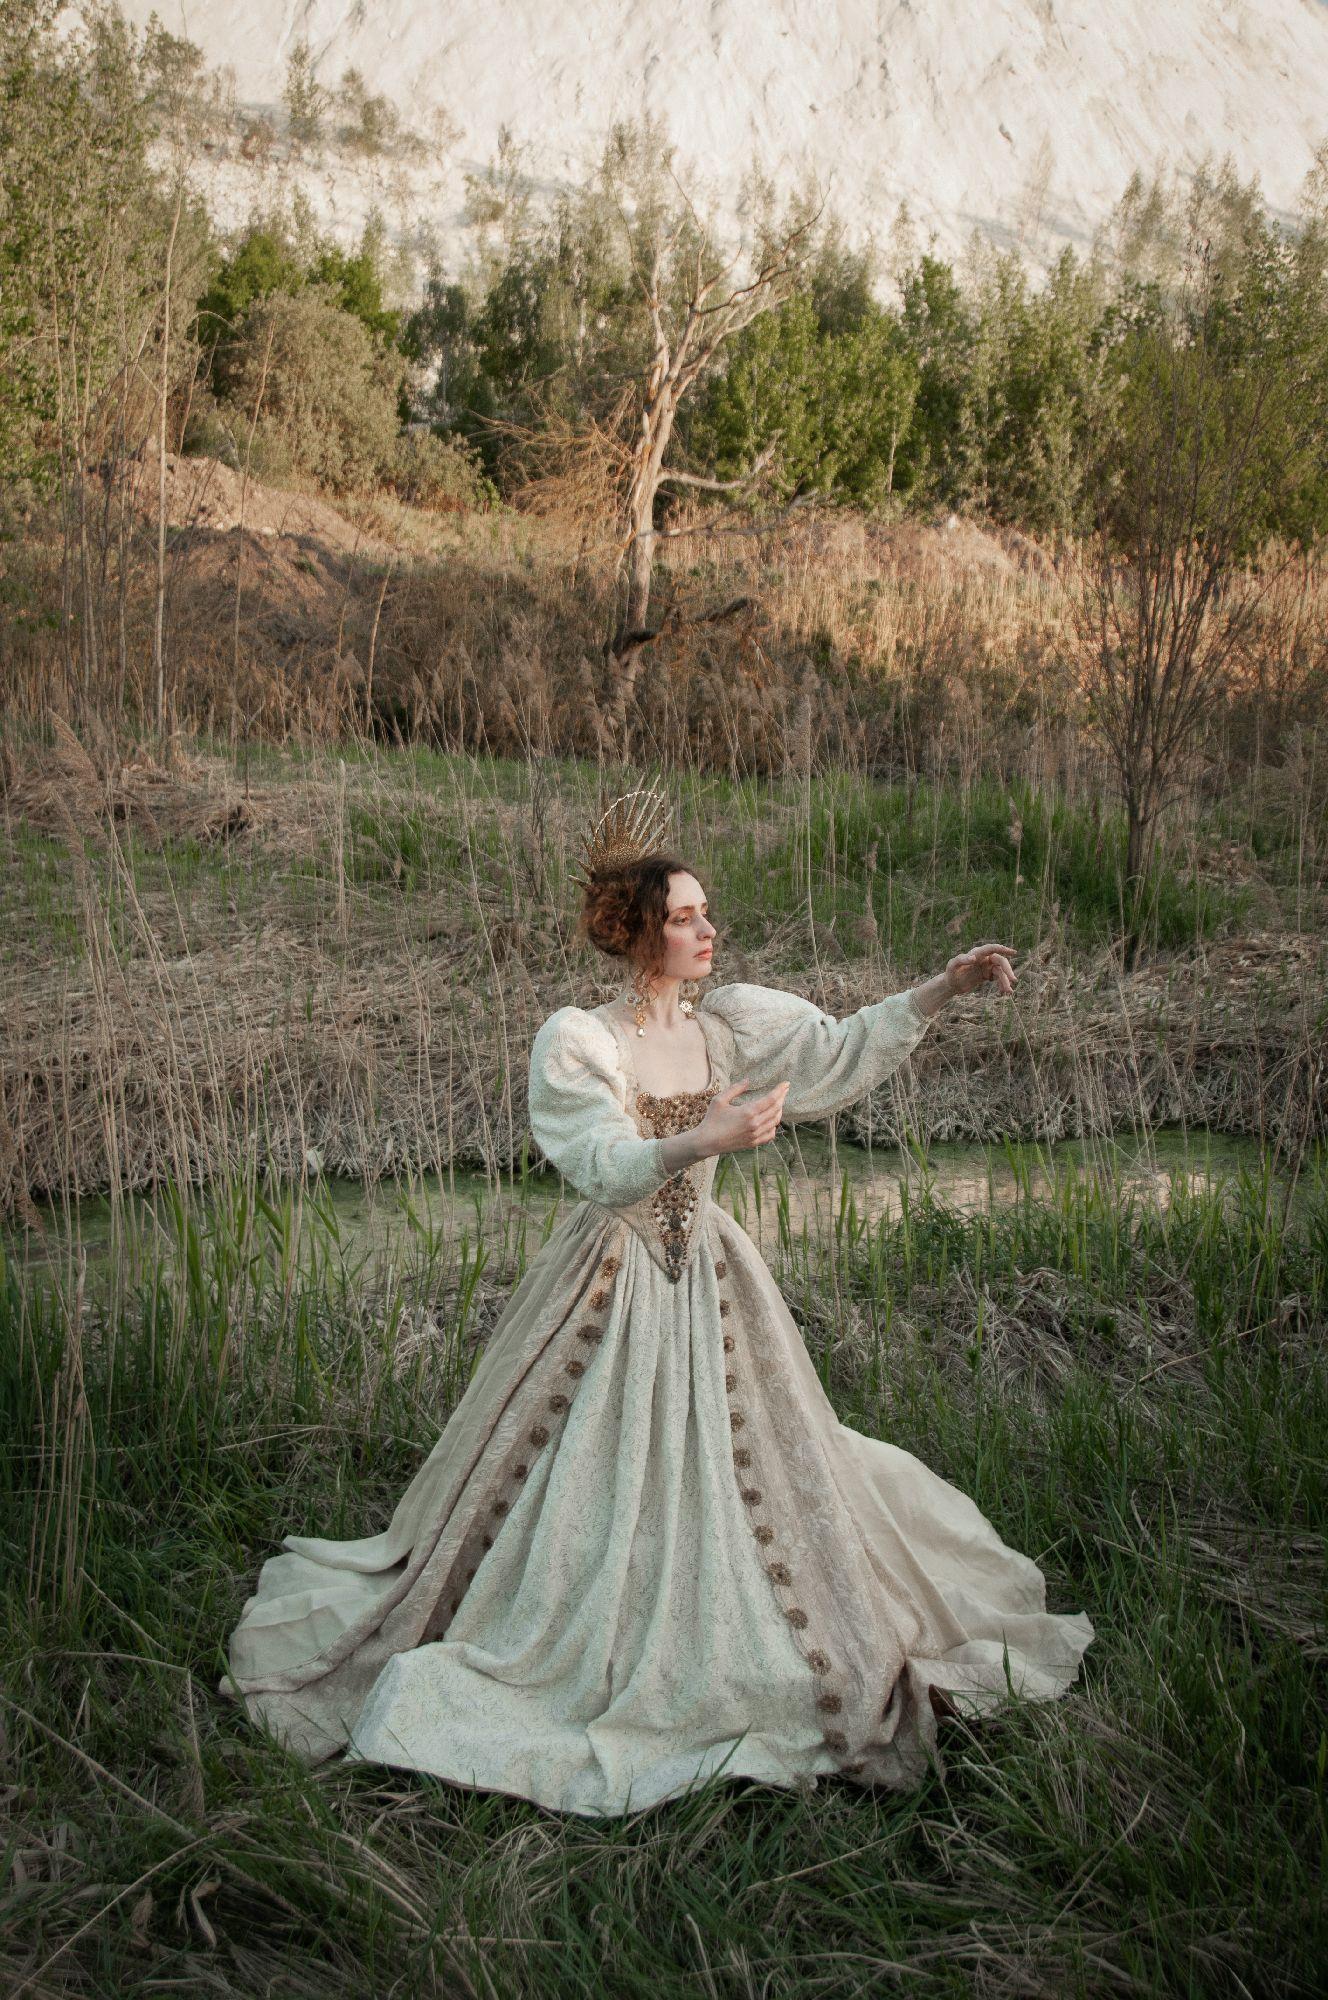 PH/MUAH/Idea: © Мила Рогова/Milanxoli Art. Платье: Katrin's Vintage. Model: SoLutova